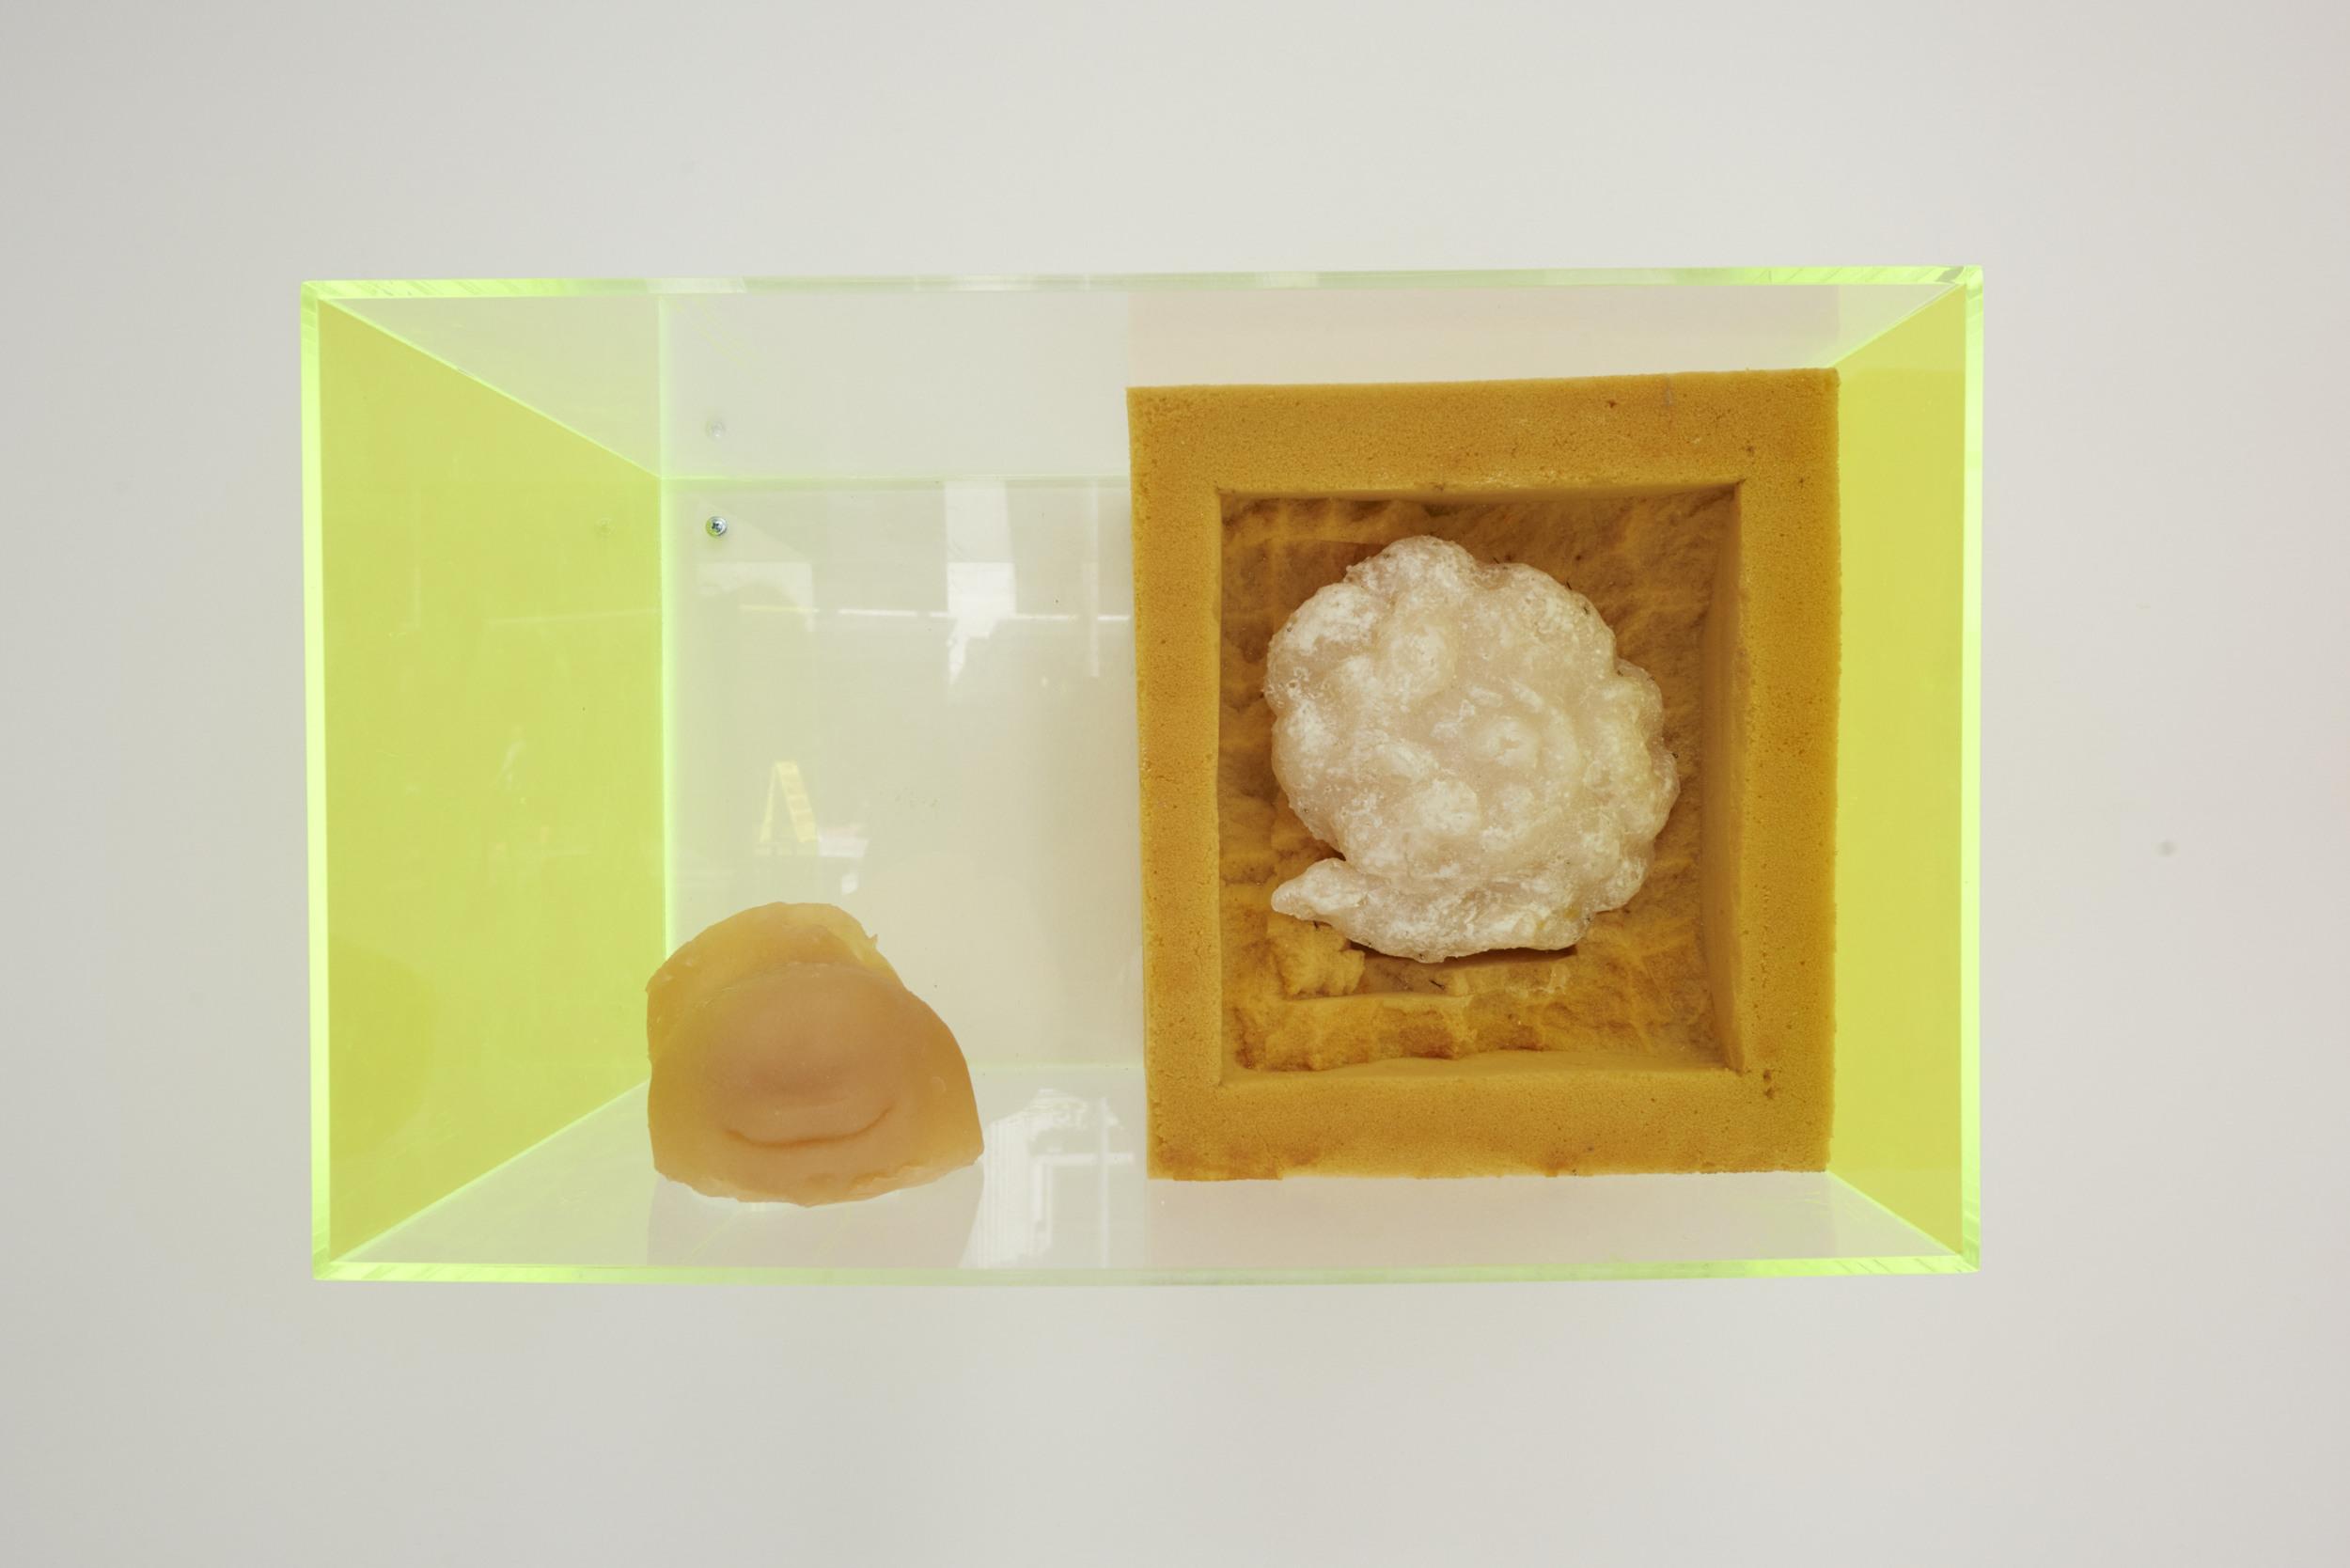 Whitney Vangrin  Soft Jaw , 2013 DragonSkin silicone rubber, salt, upholstery foam, Plexiglas 20 x 12 x 12 in